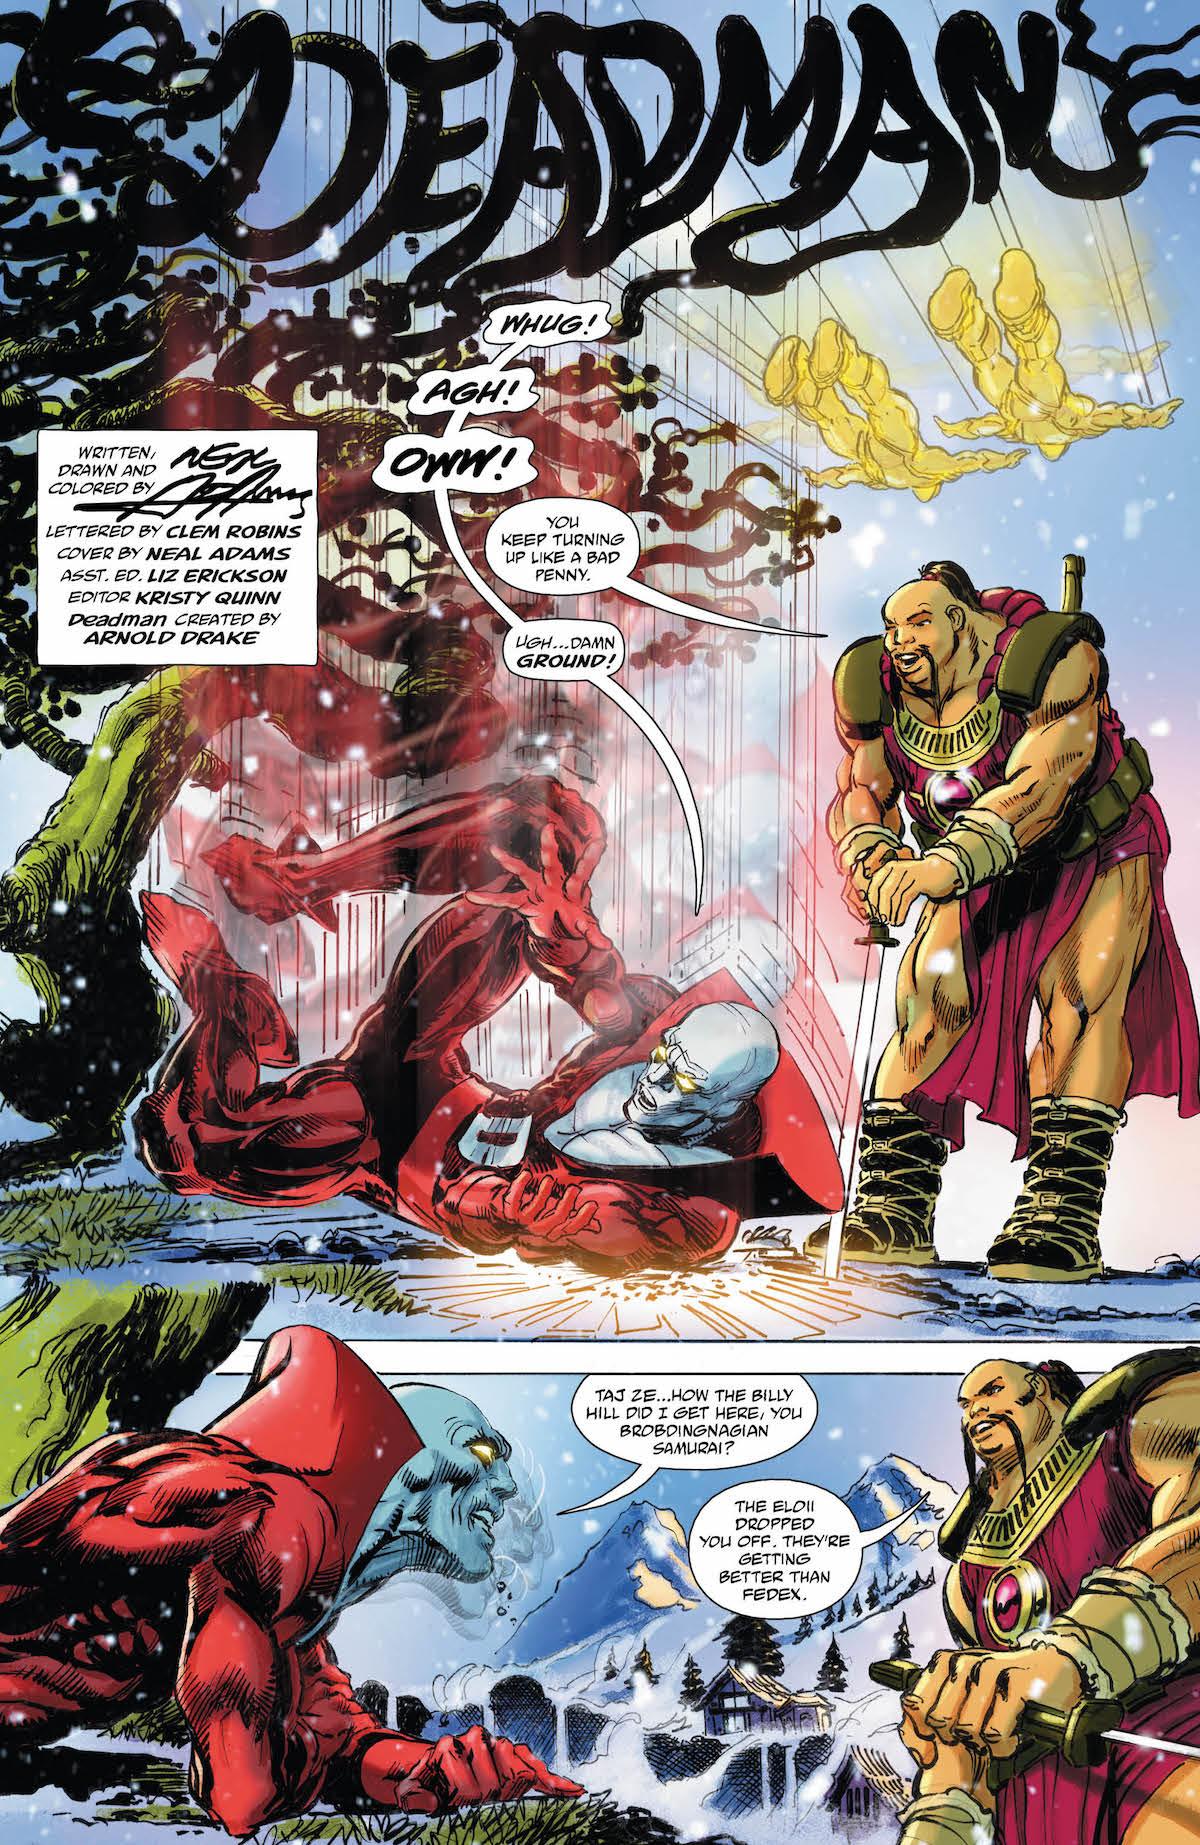 Deadman #5 page 1